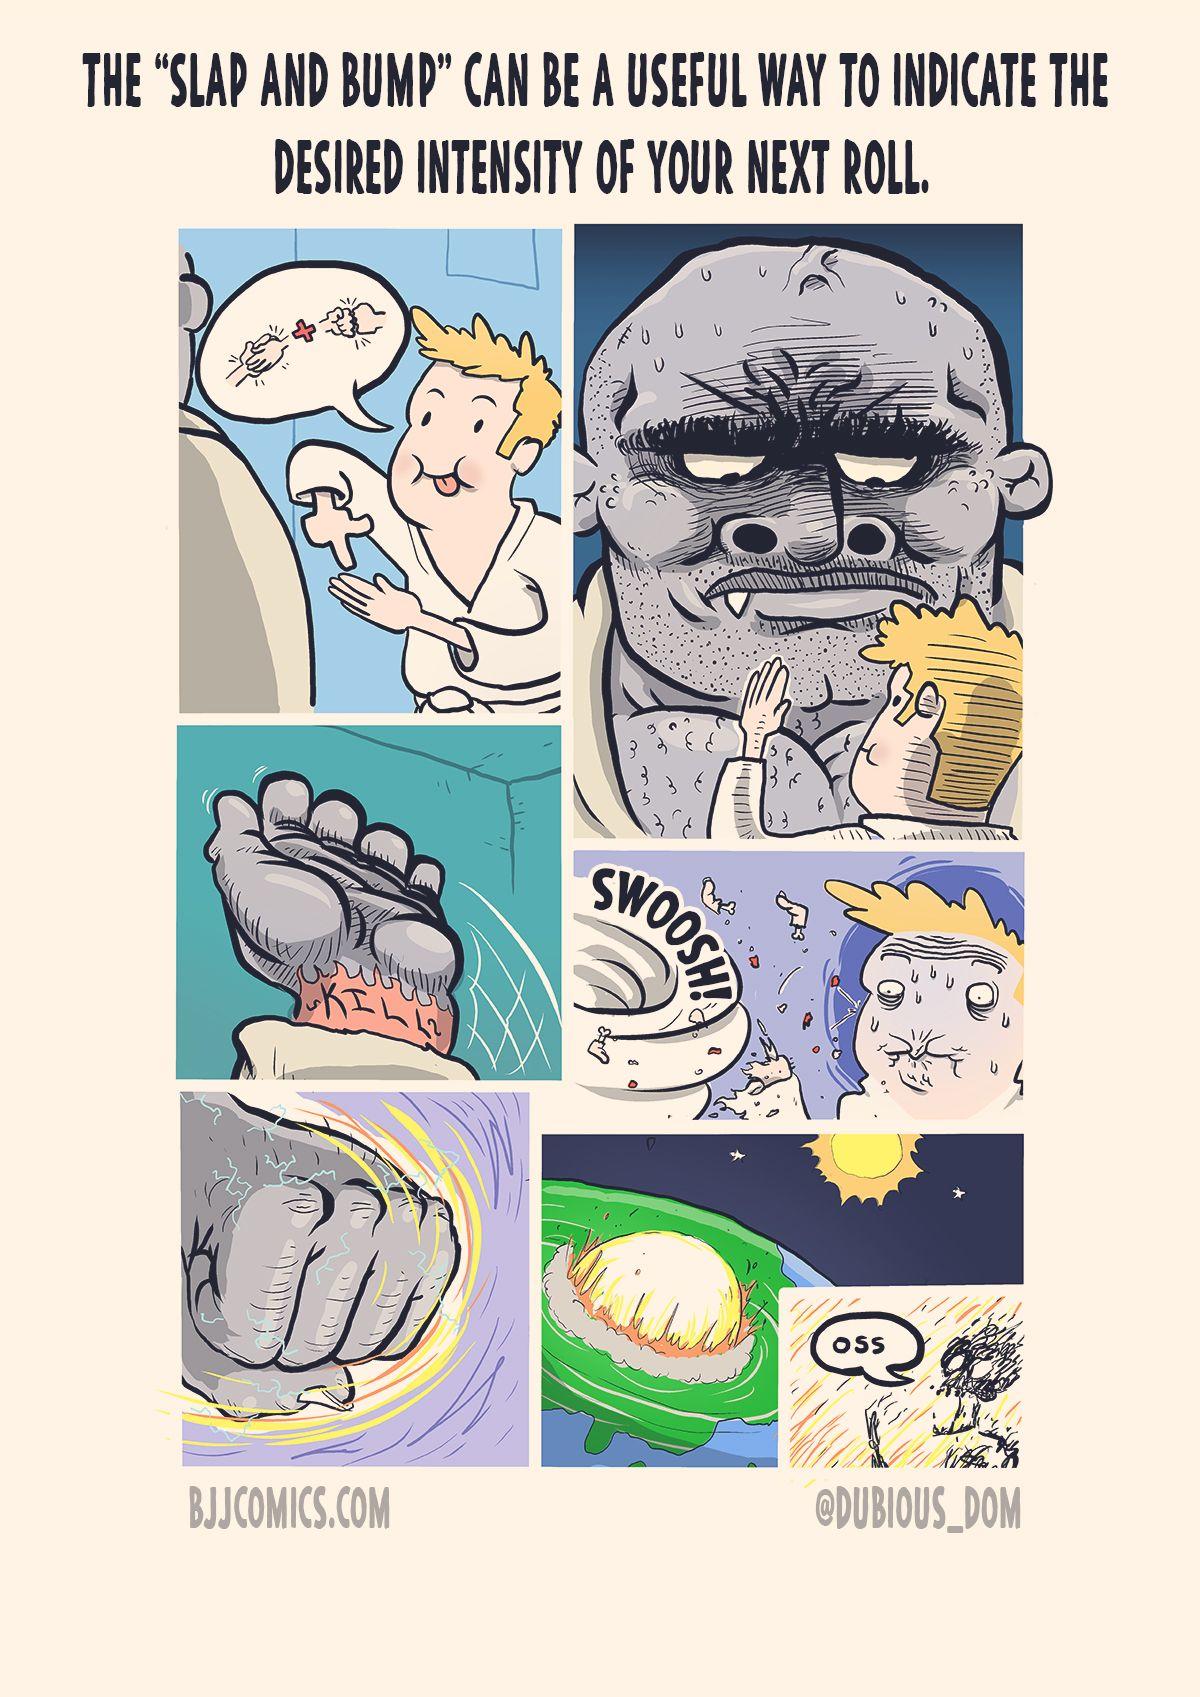 Bjj comics